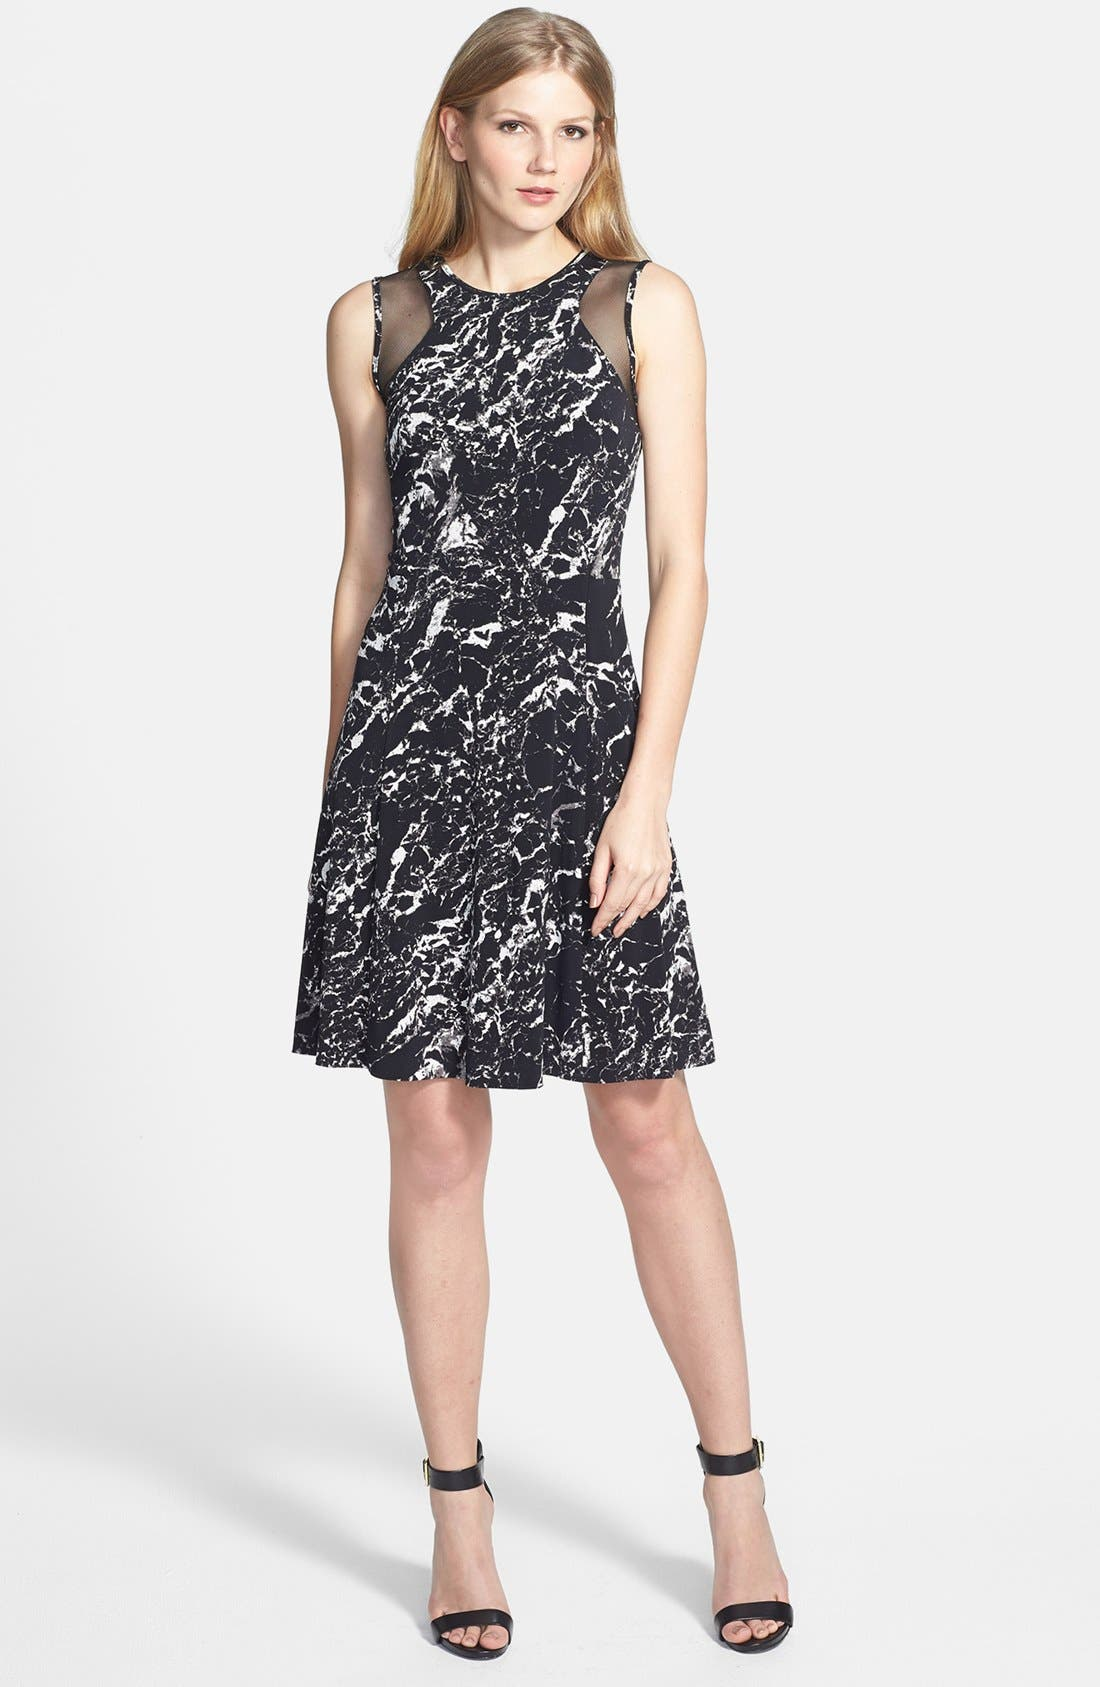 Alternate Image 1 Selected - Vince Camuto Sheer Inset Marble Print Ponte Dress